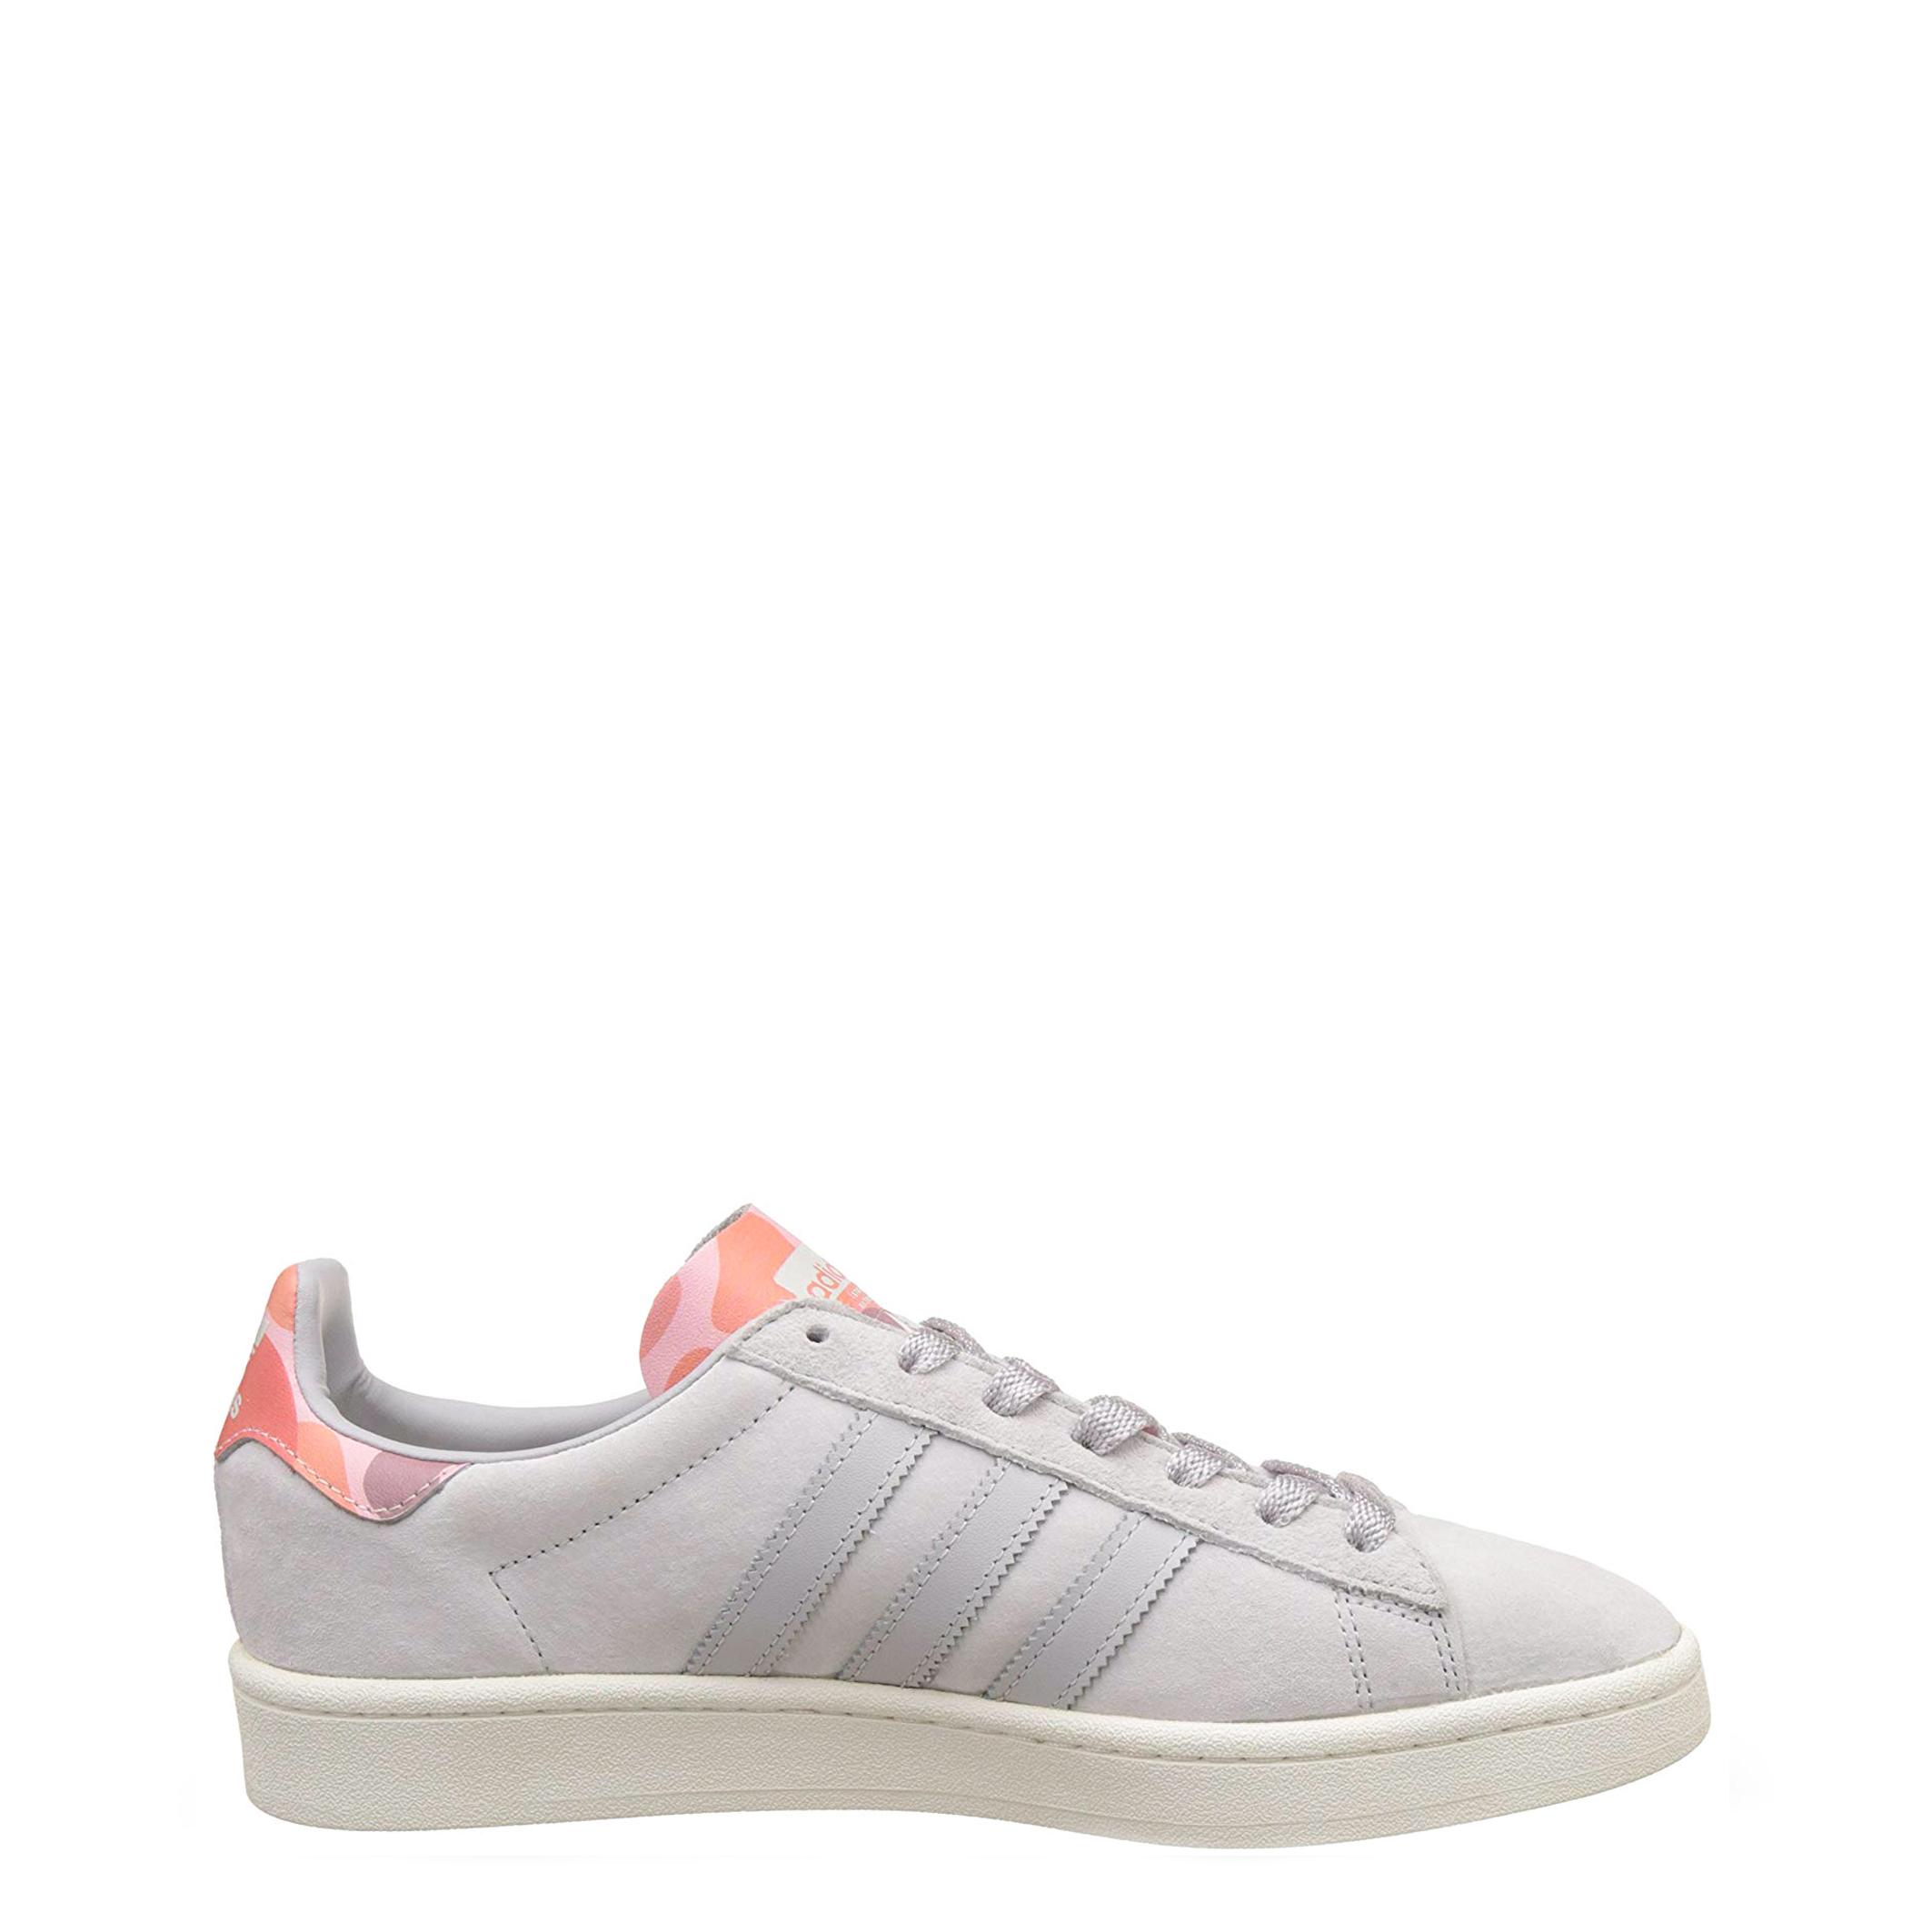 Adidas ADULTS_CAMPUS